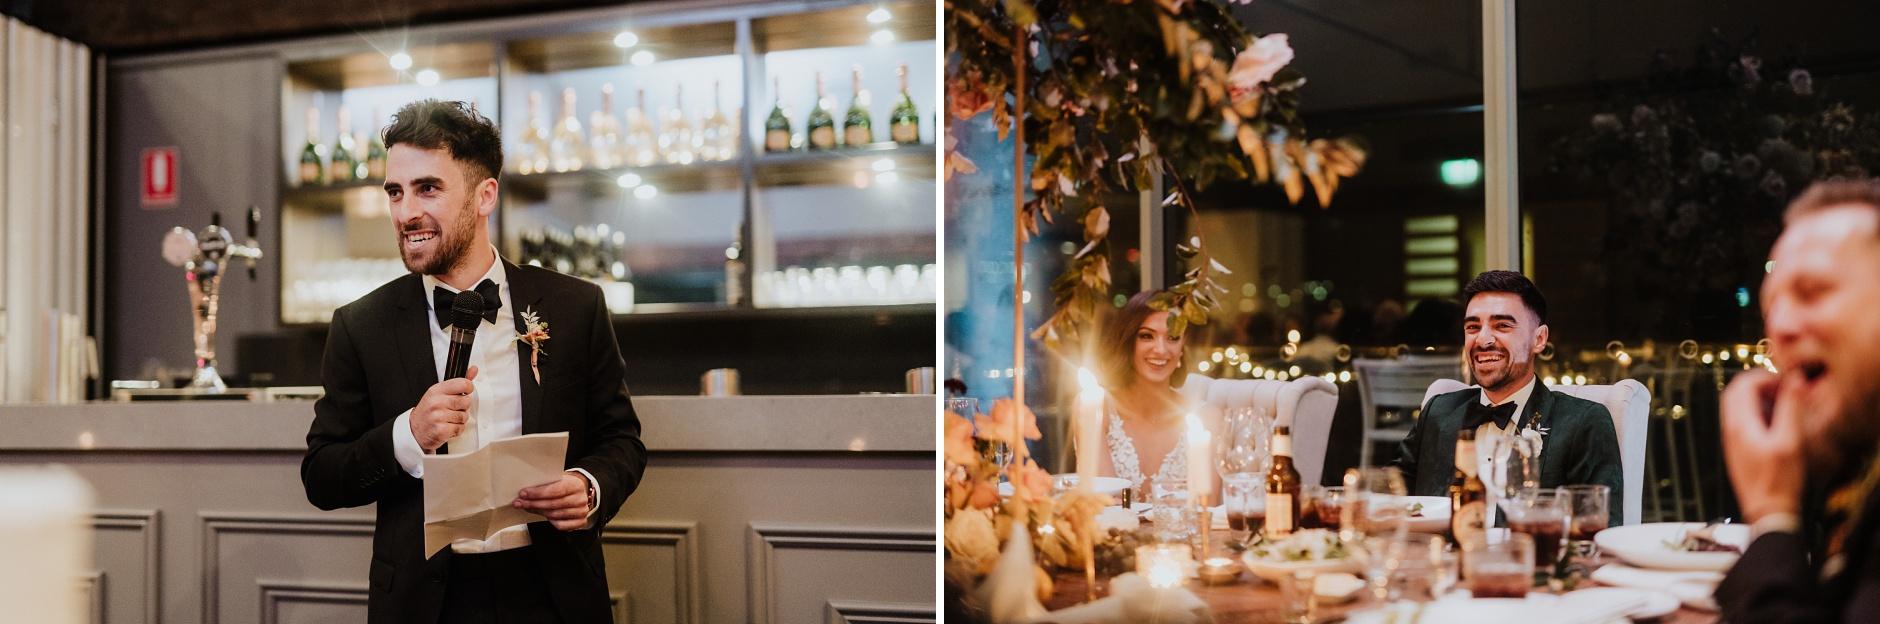 Sydney-Wedding-Photographer_0166.jpg